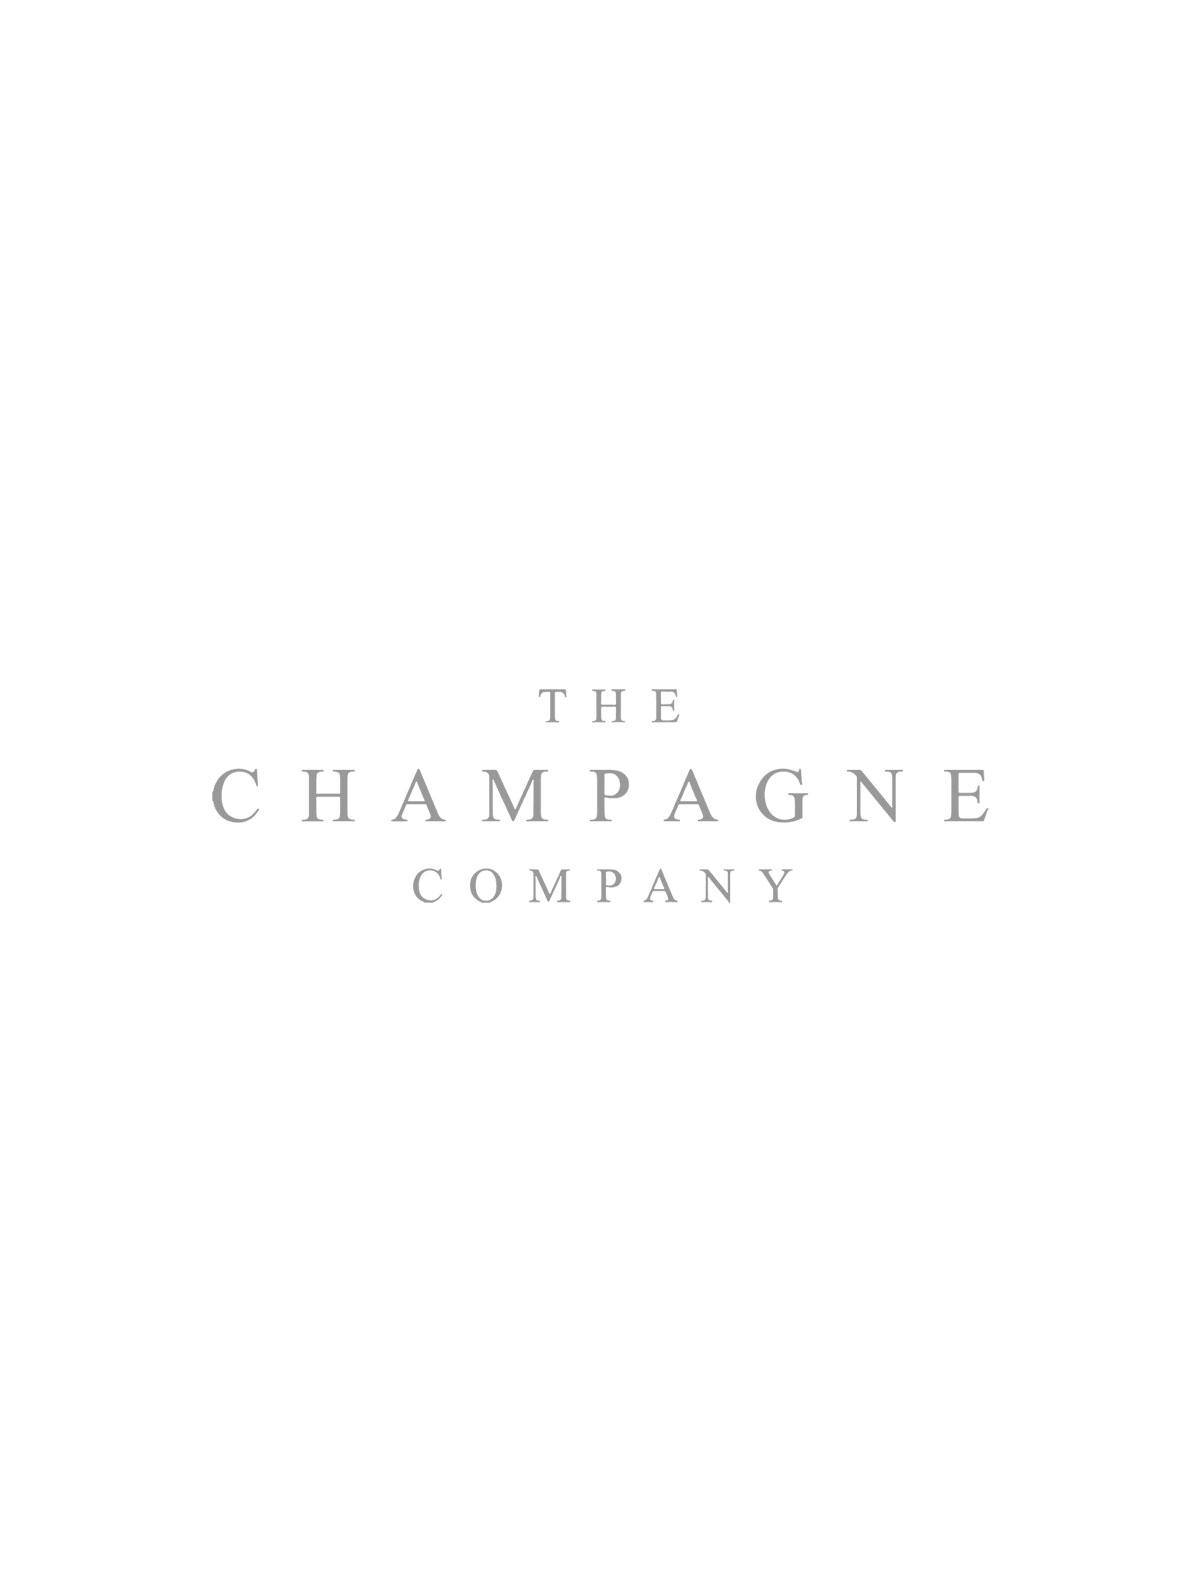 Wiston Estate Cuvee 2013 Brut Sparkling Wine 75cl